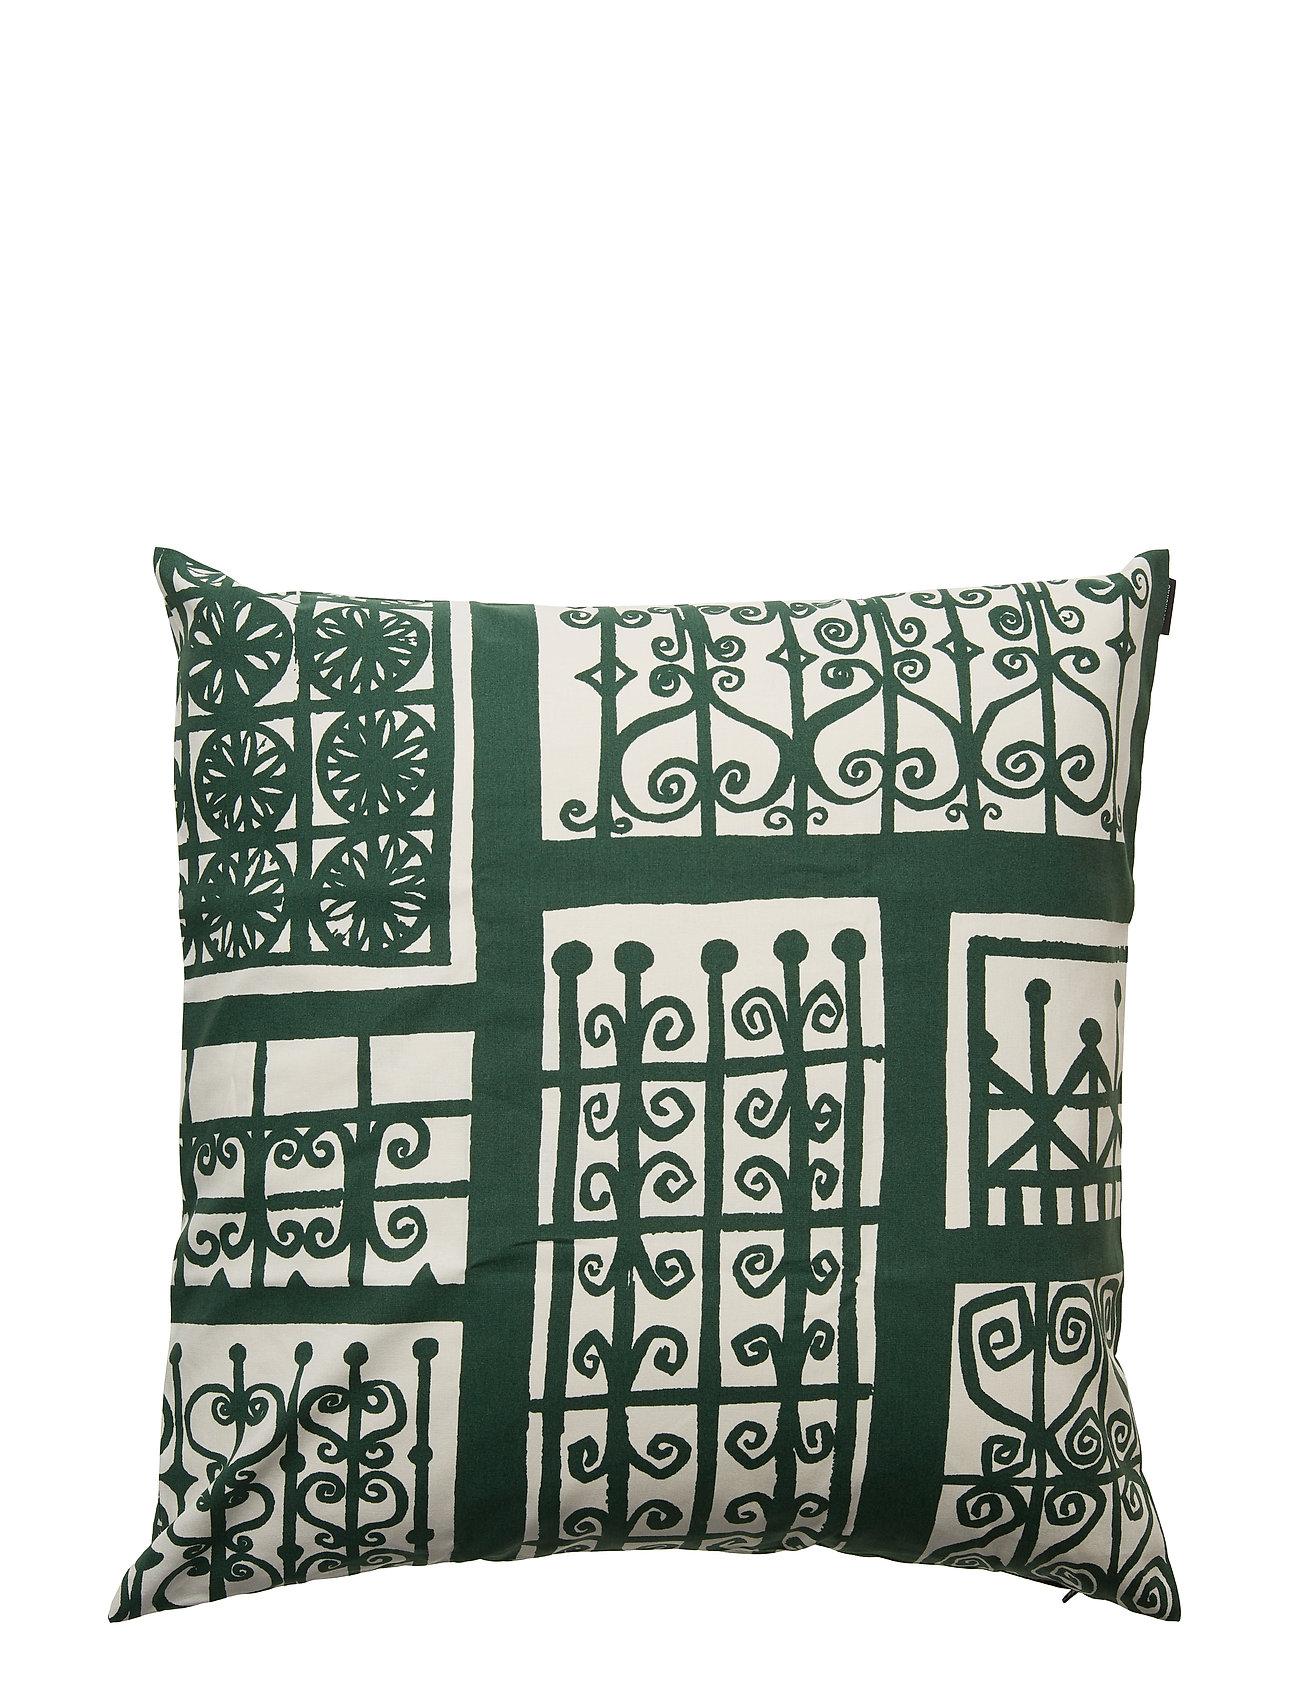 Pariisin Coverdark Cushion Home WhiteMarimekko Portit GreenOff FKlcT1J